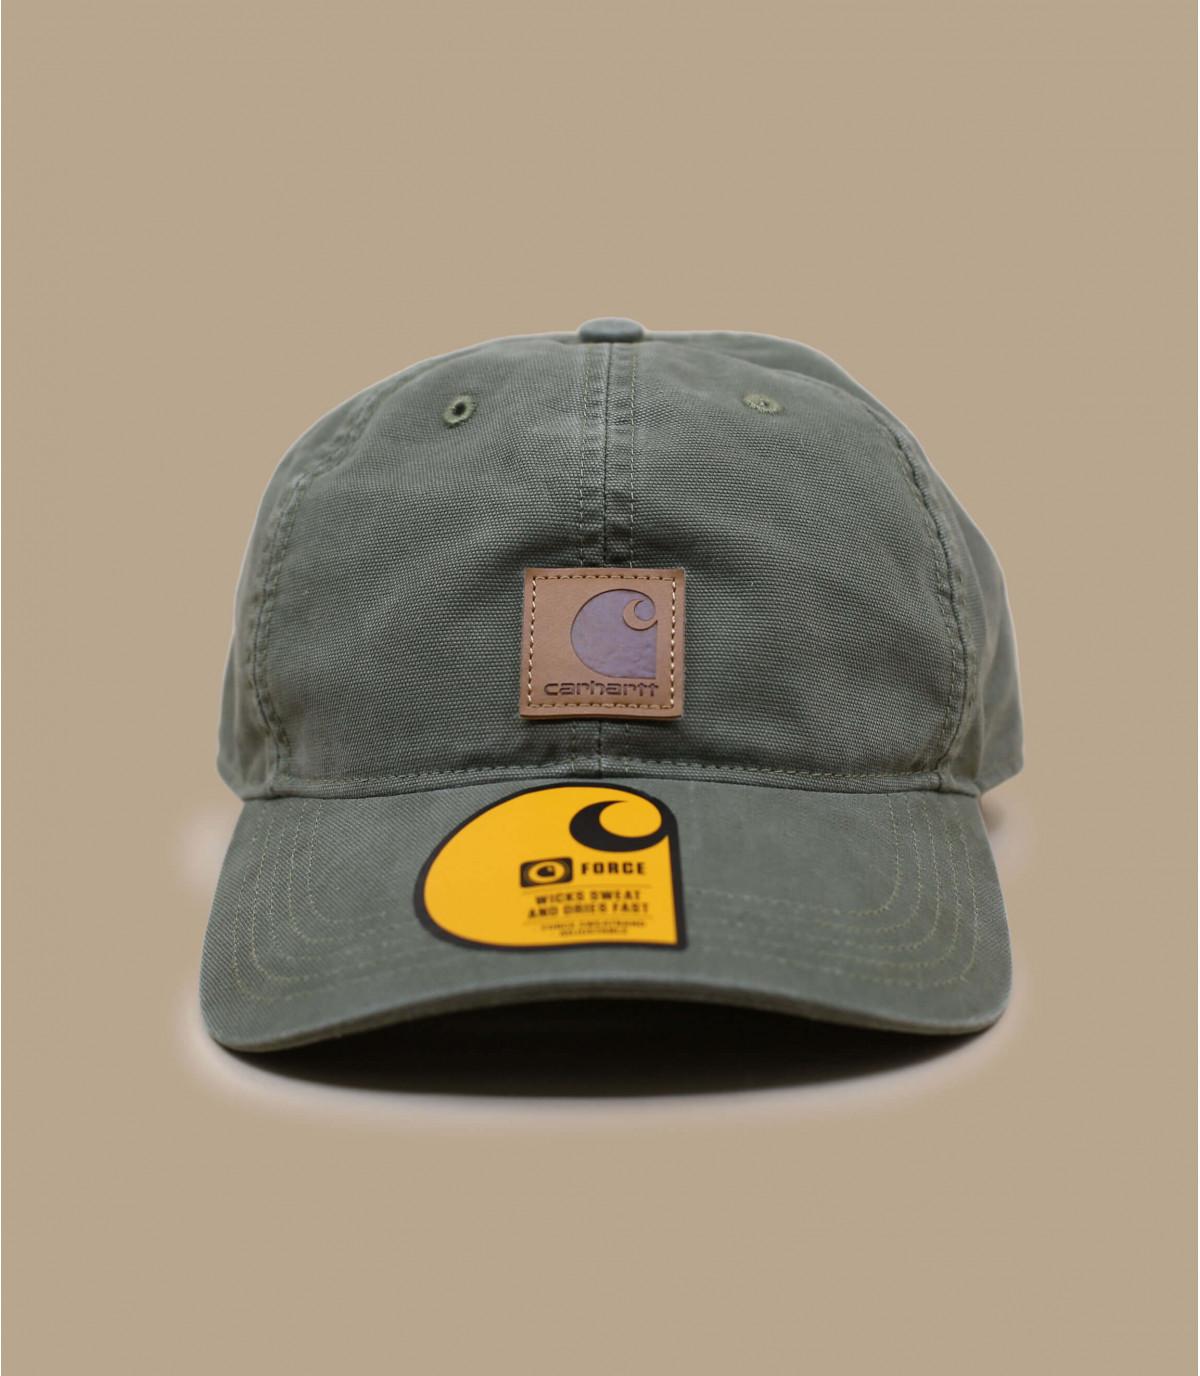 gorra curva parche verde Carhartt - Cap Carhartt odessa army green ... 52572c3208d